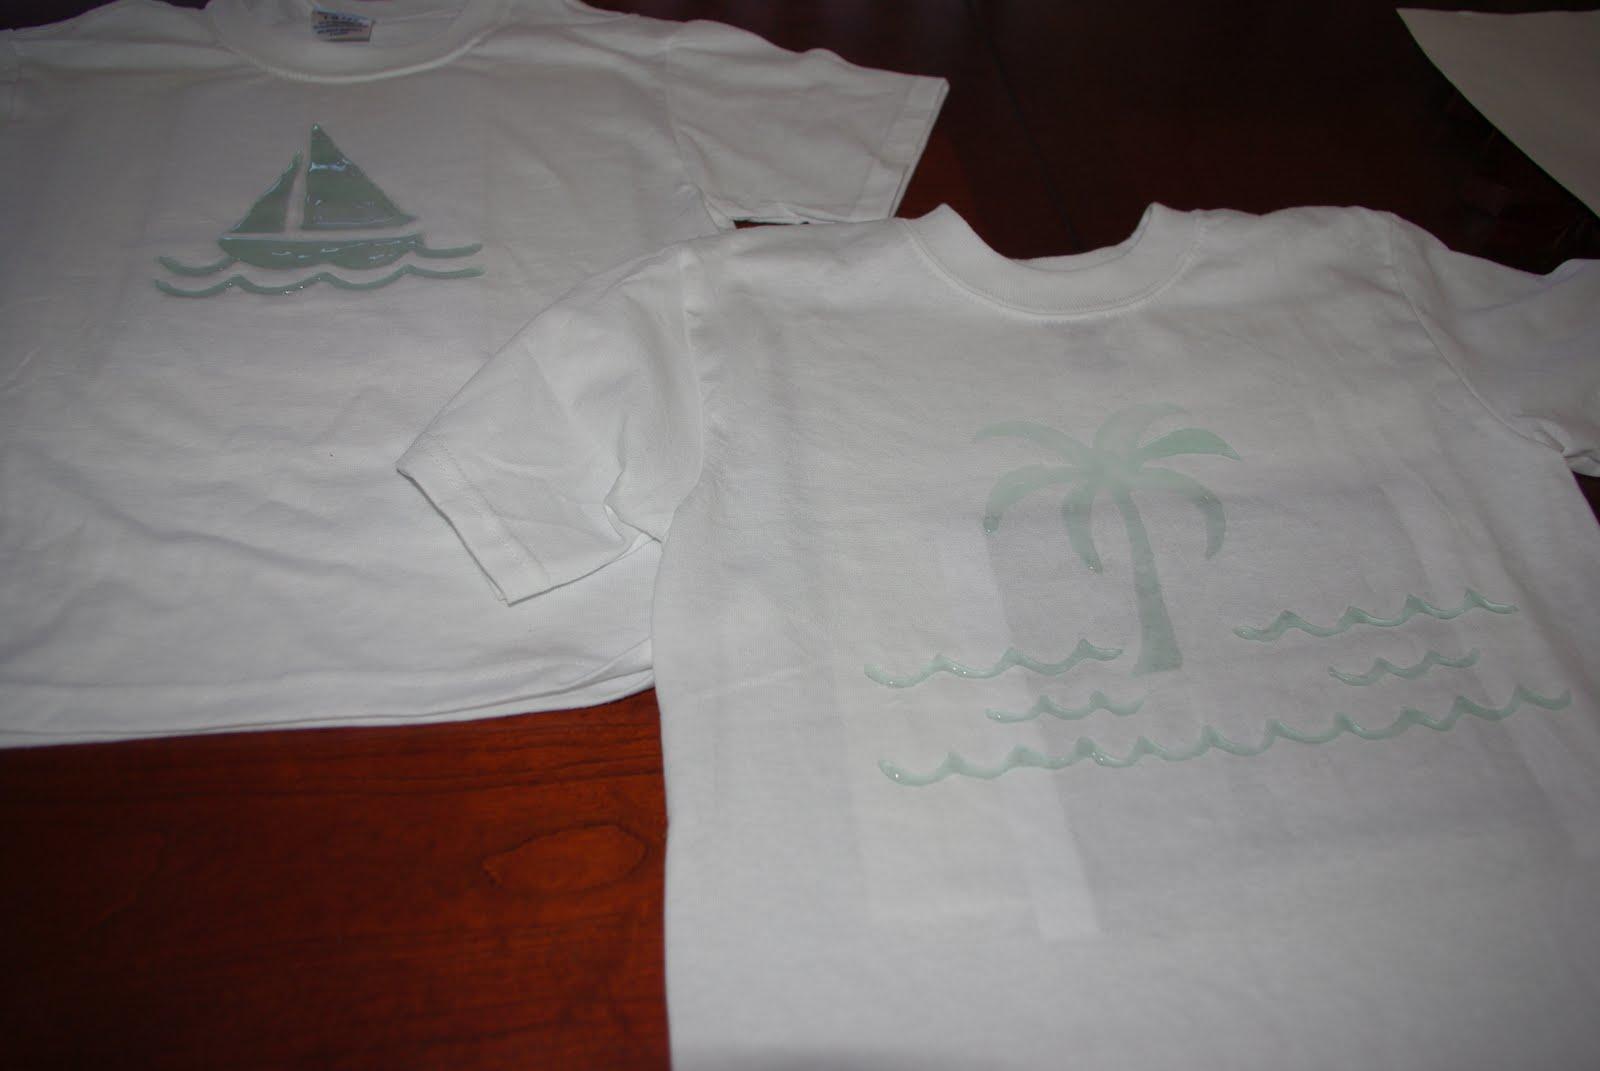 wholesale dealer b483a b6a3c Glue Batik Shirts {Tutorial} - Happiness is Homemade